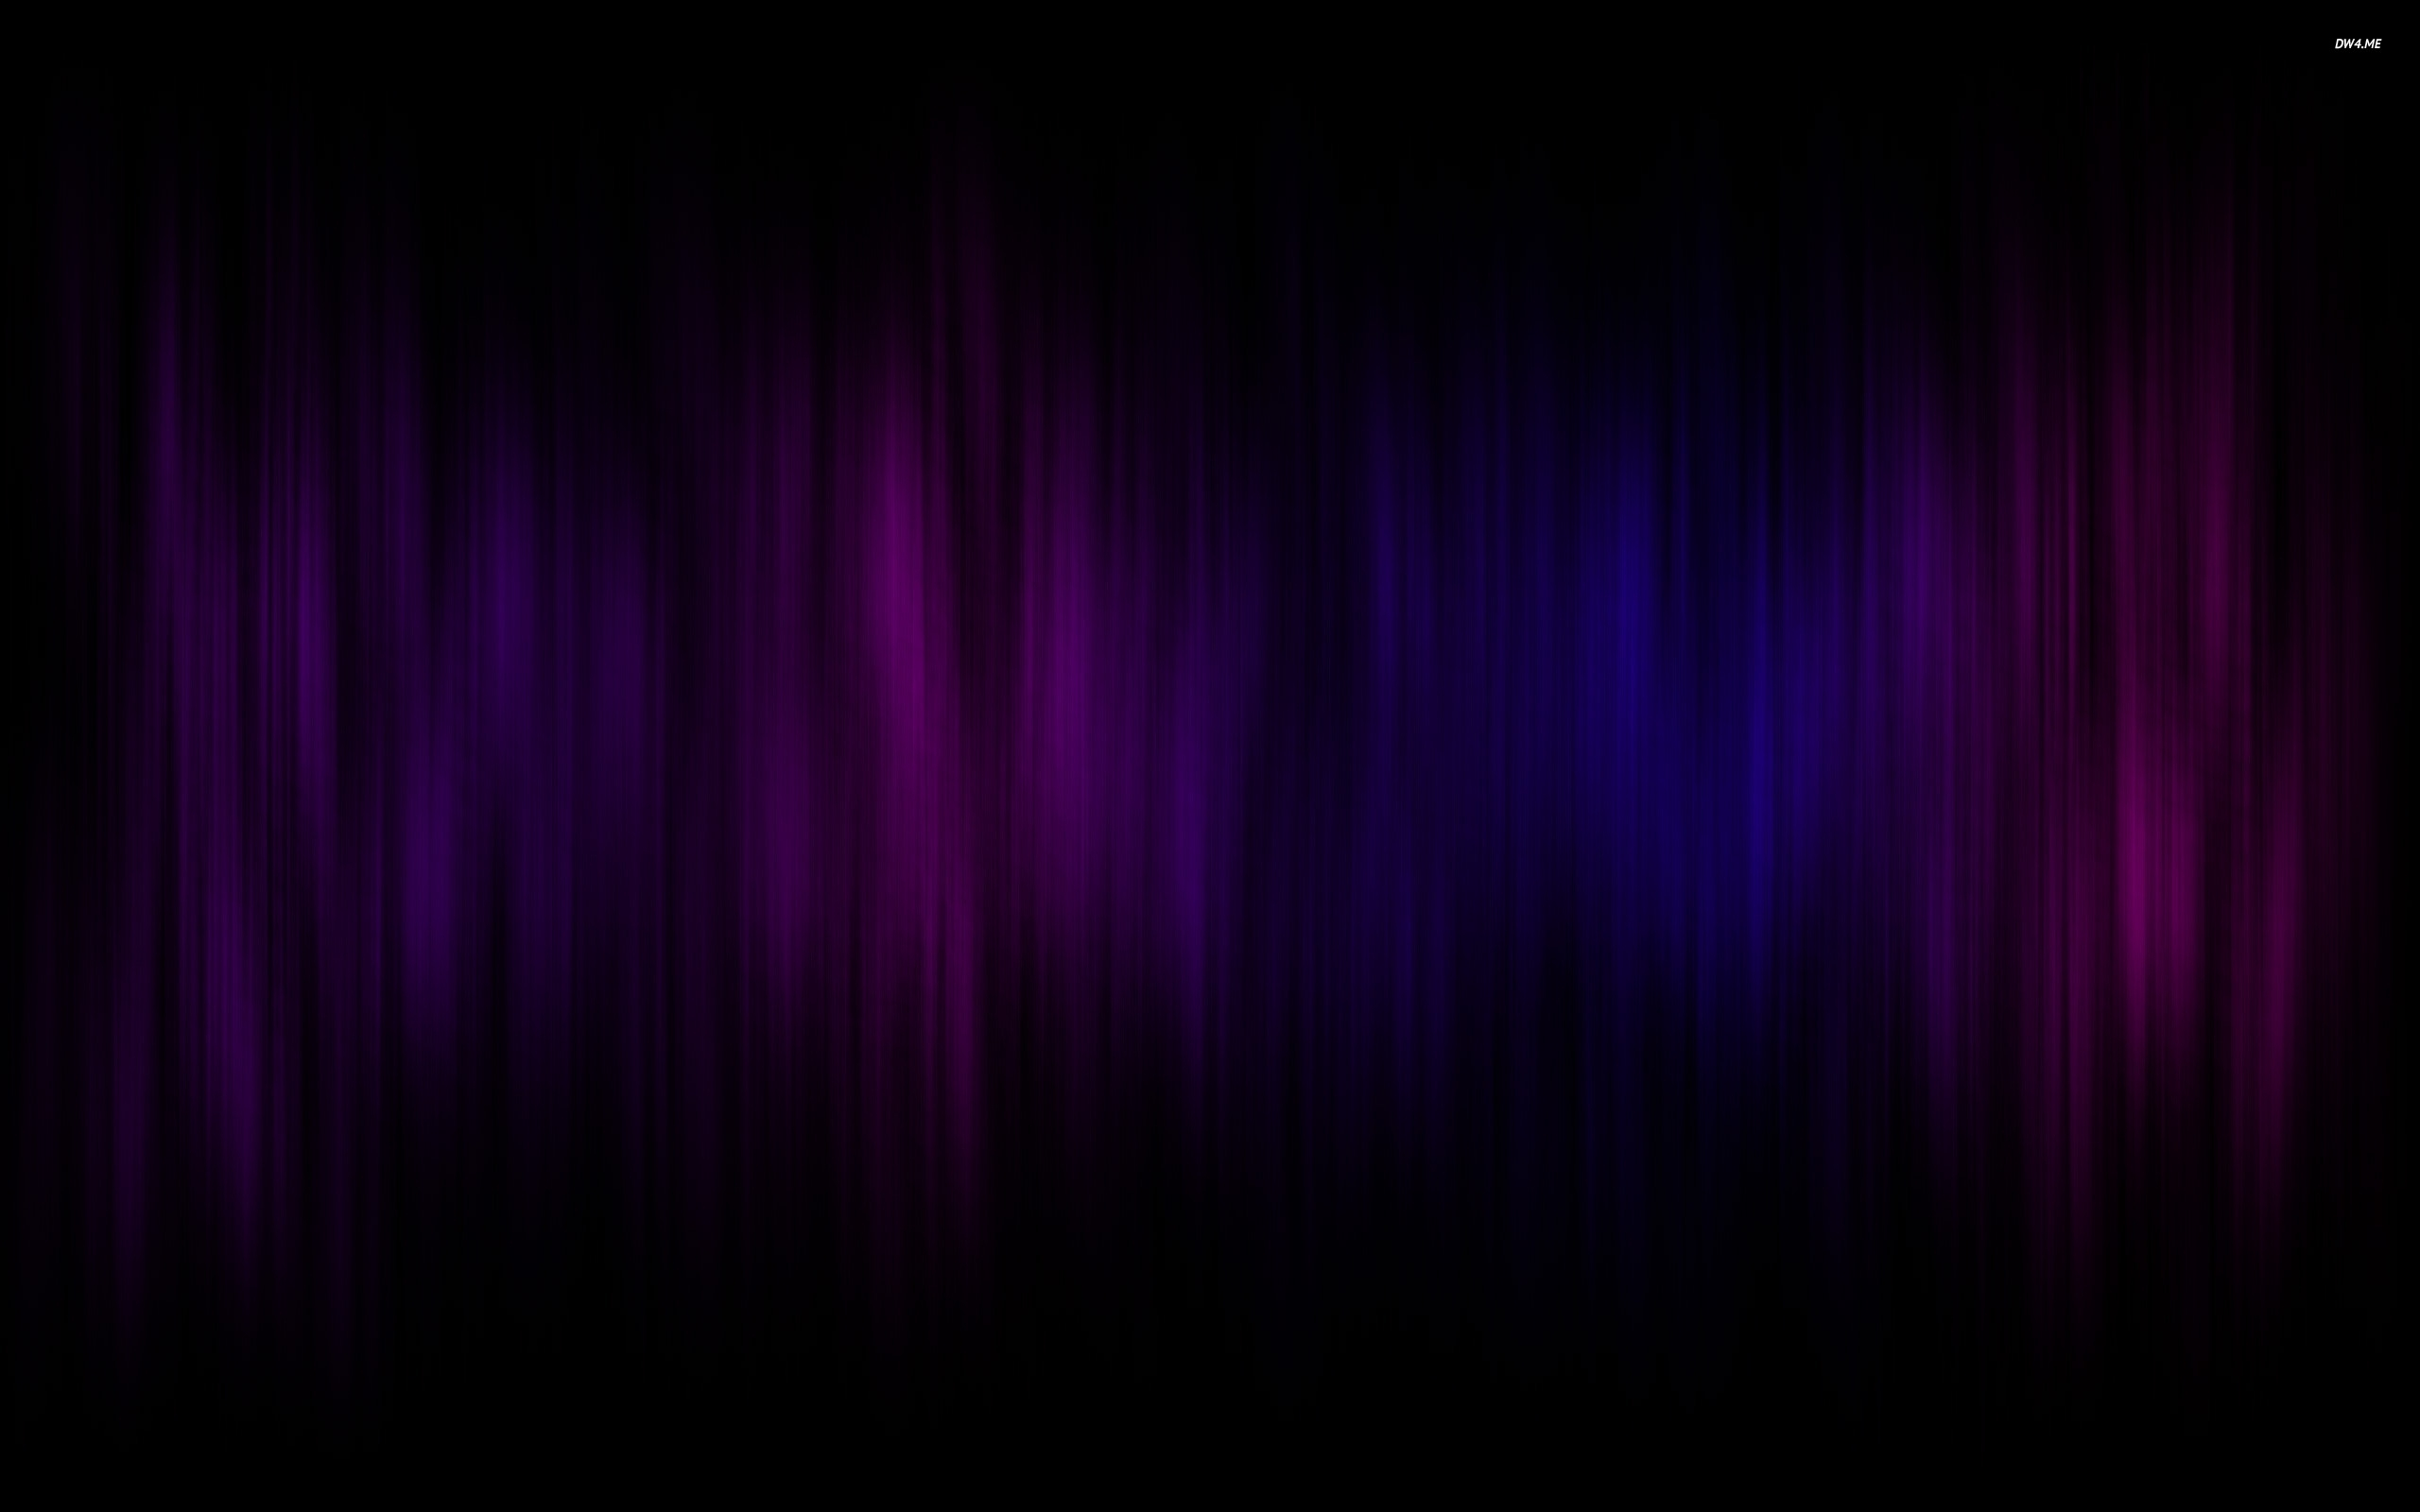 purple abstract black wallpaper 28416 - baltana